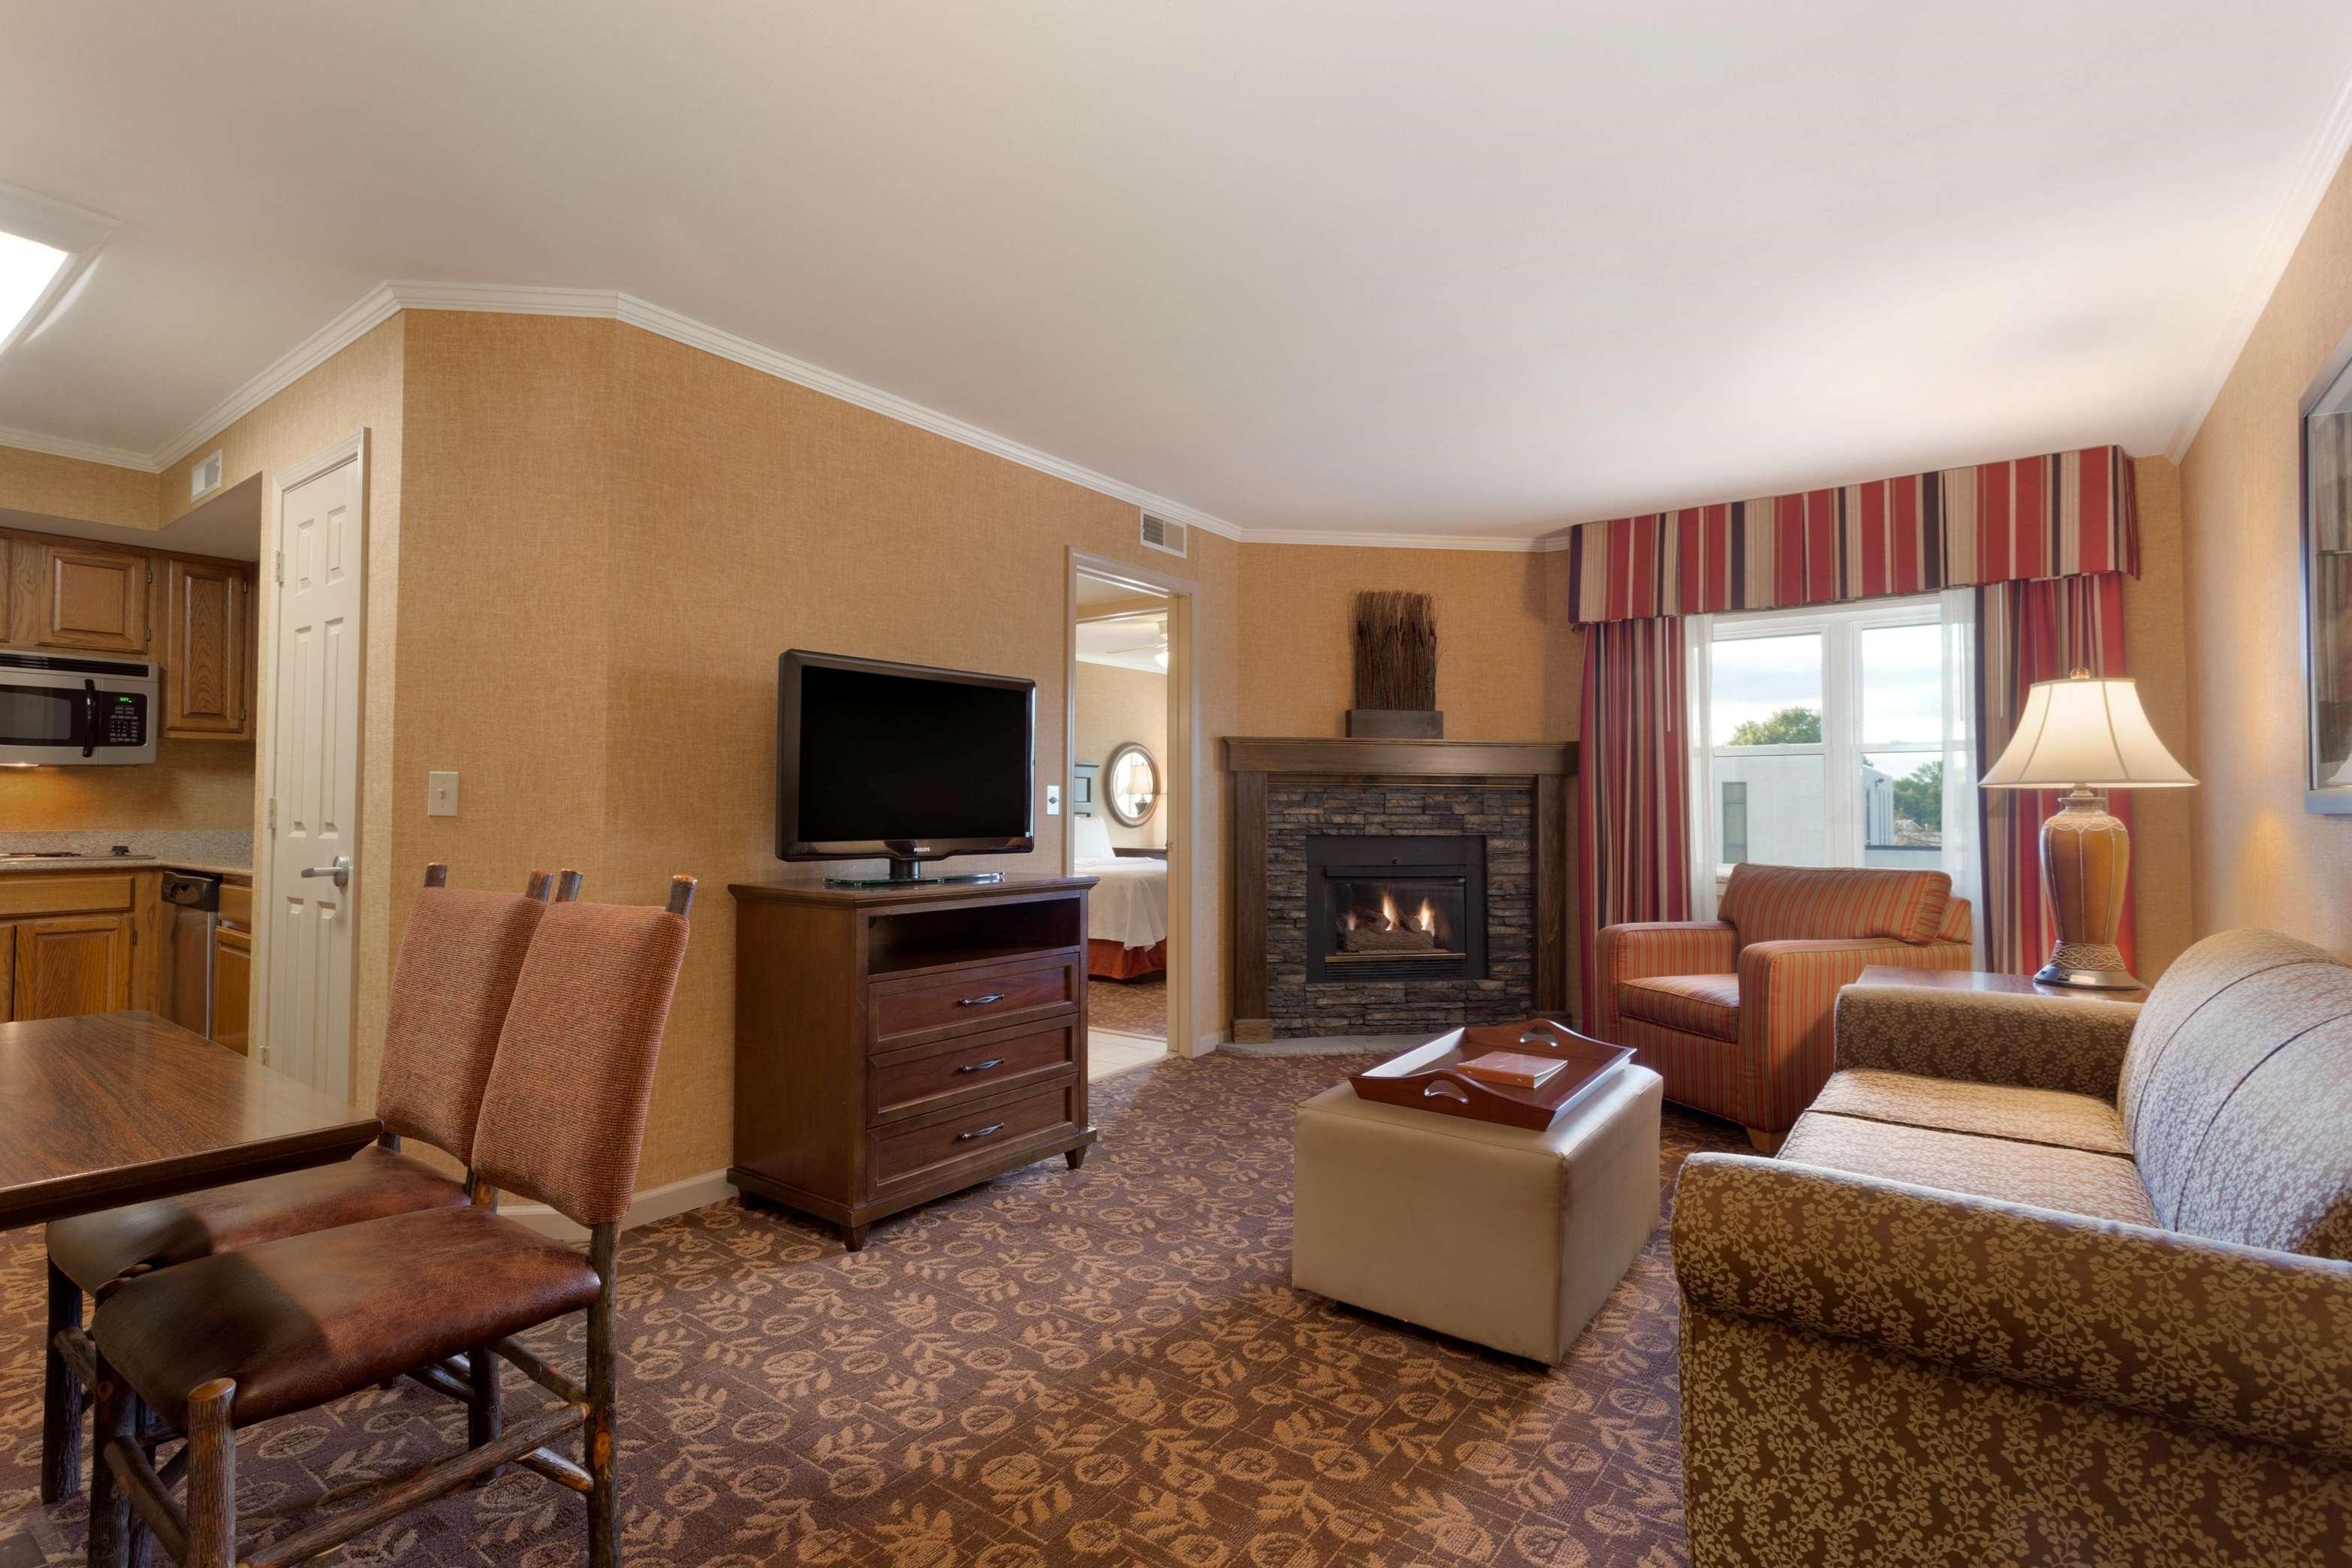 Homewood Suites by Hilton Syracuse/Liverpool image 16